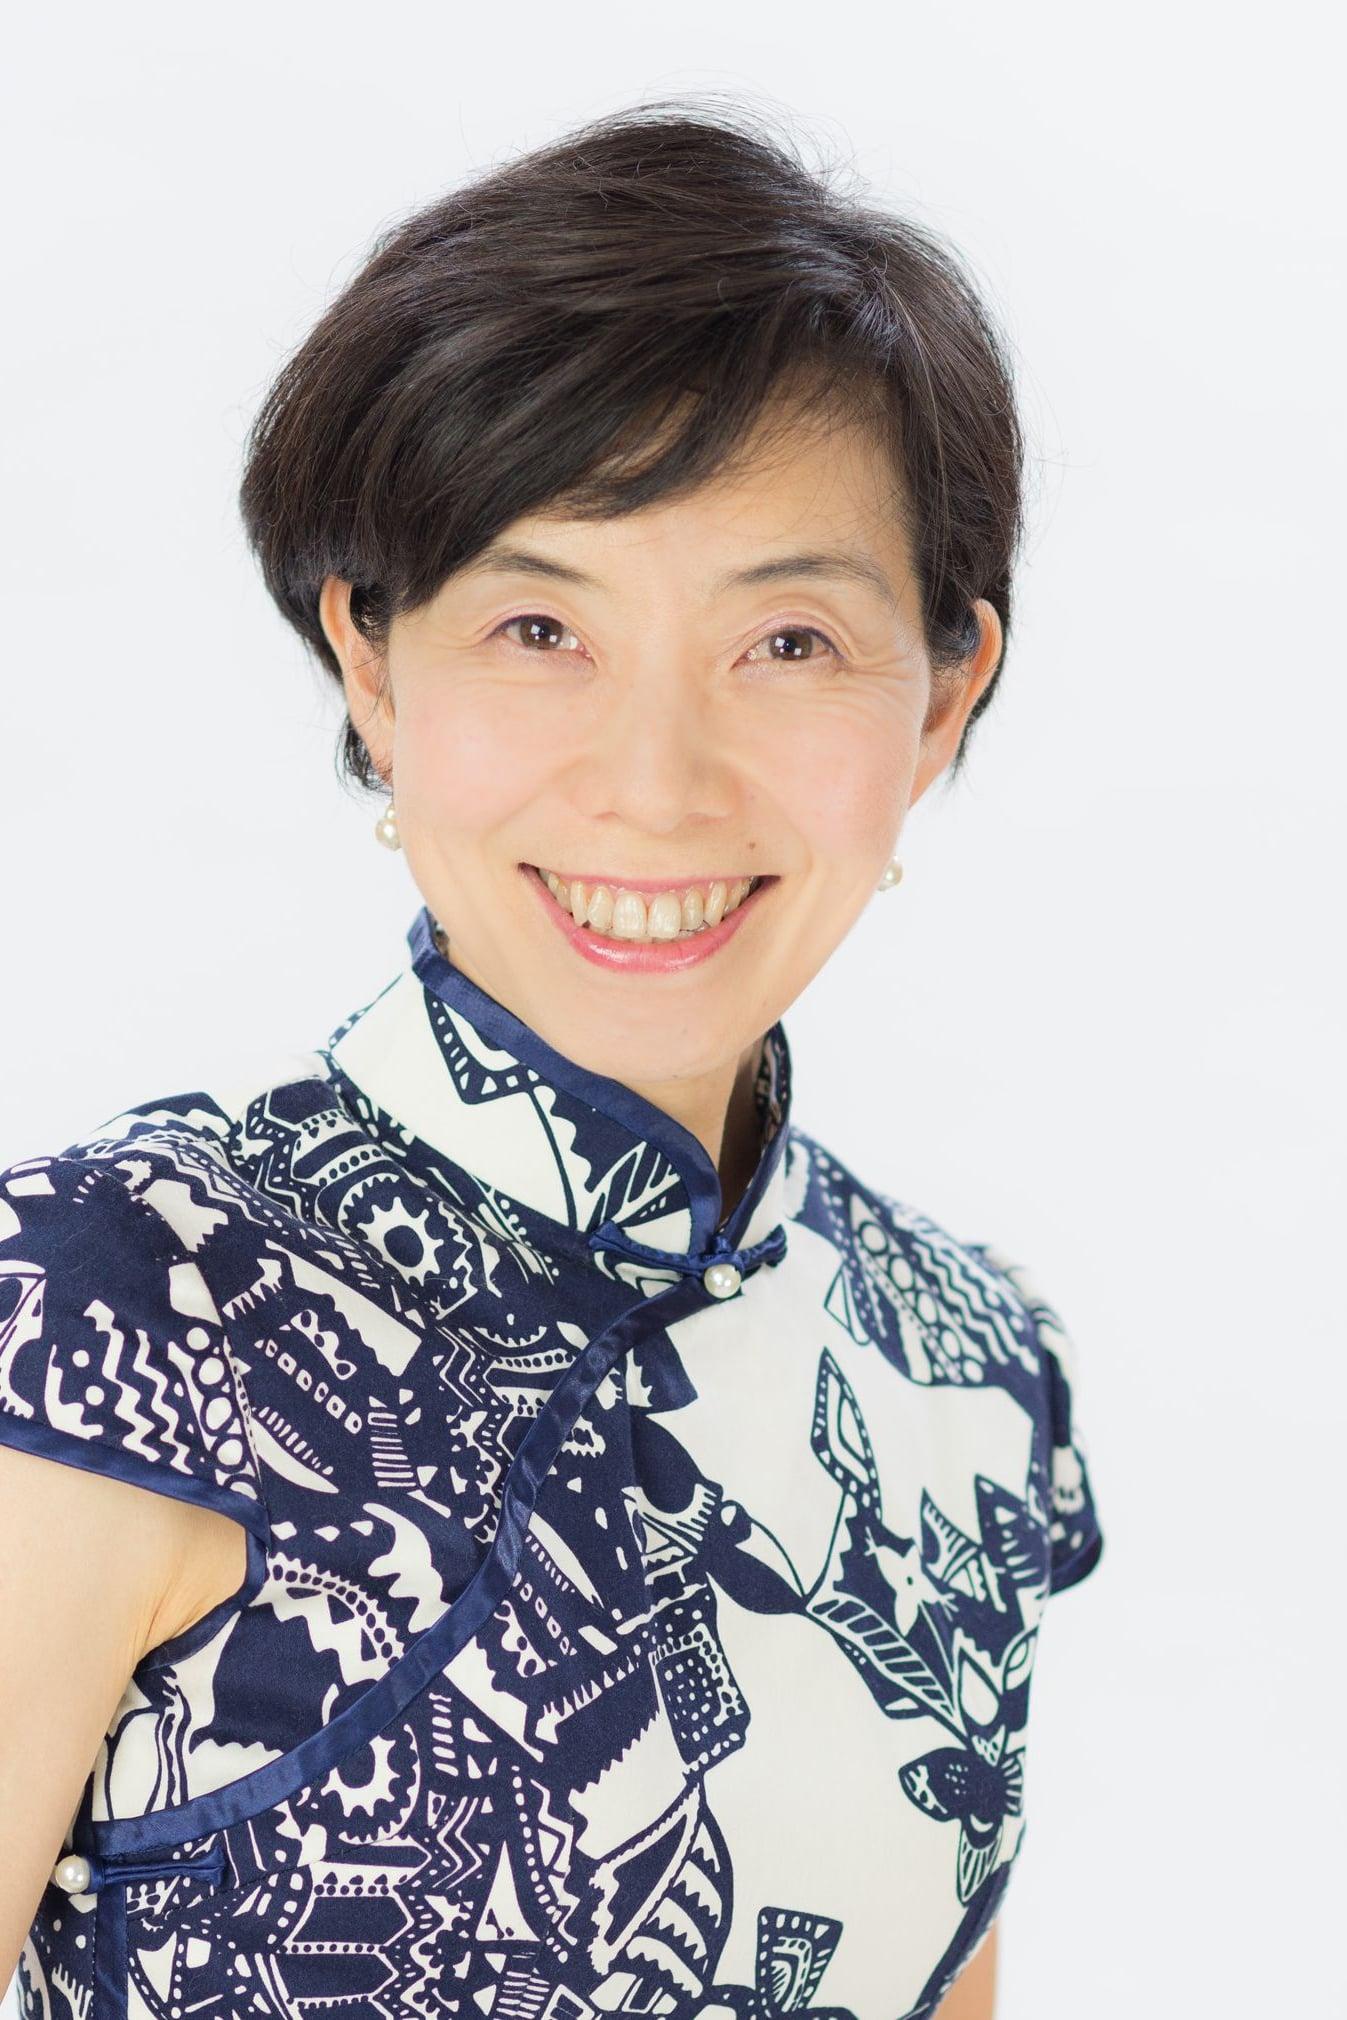 Sumi Sakaguchi